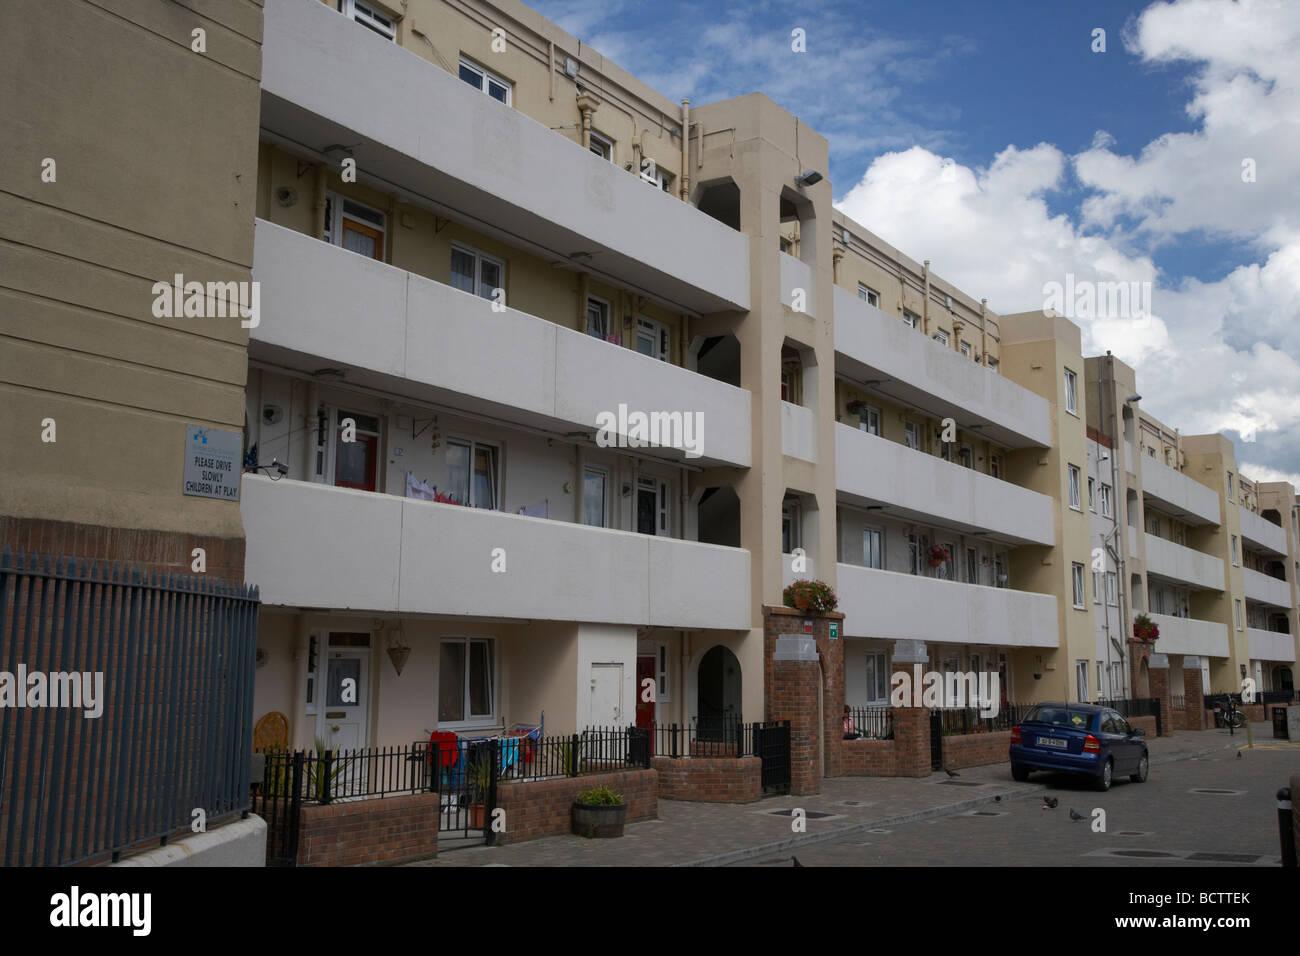 social housing development 1930s pearse house flats in dublins lower sandwith street inner city dublin city centre - Stock Image